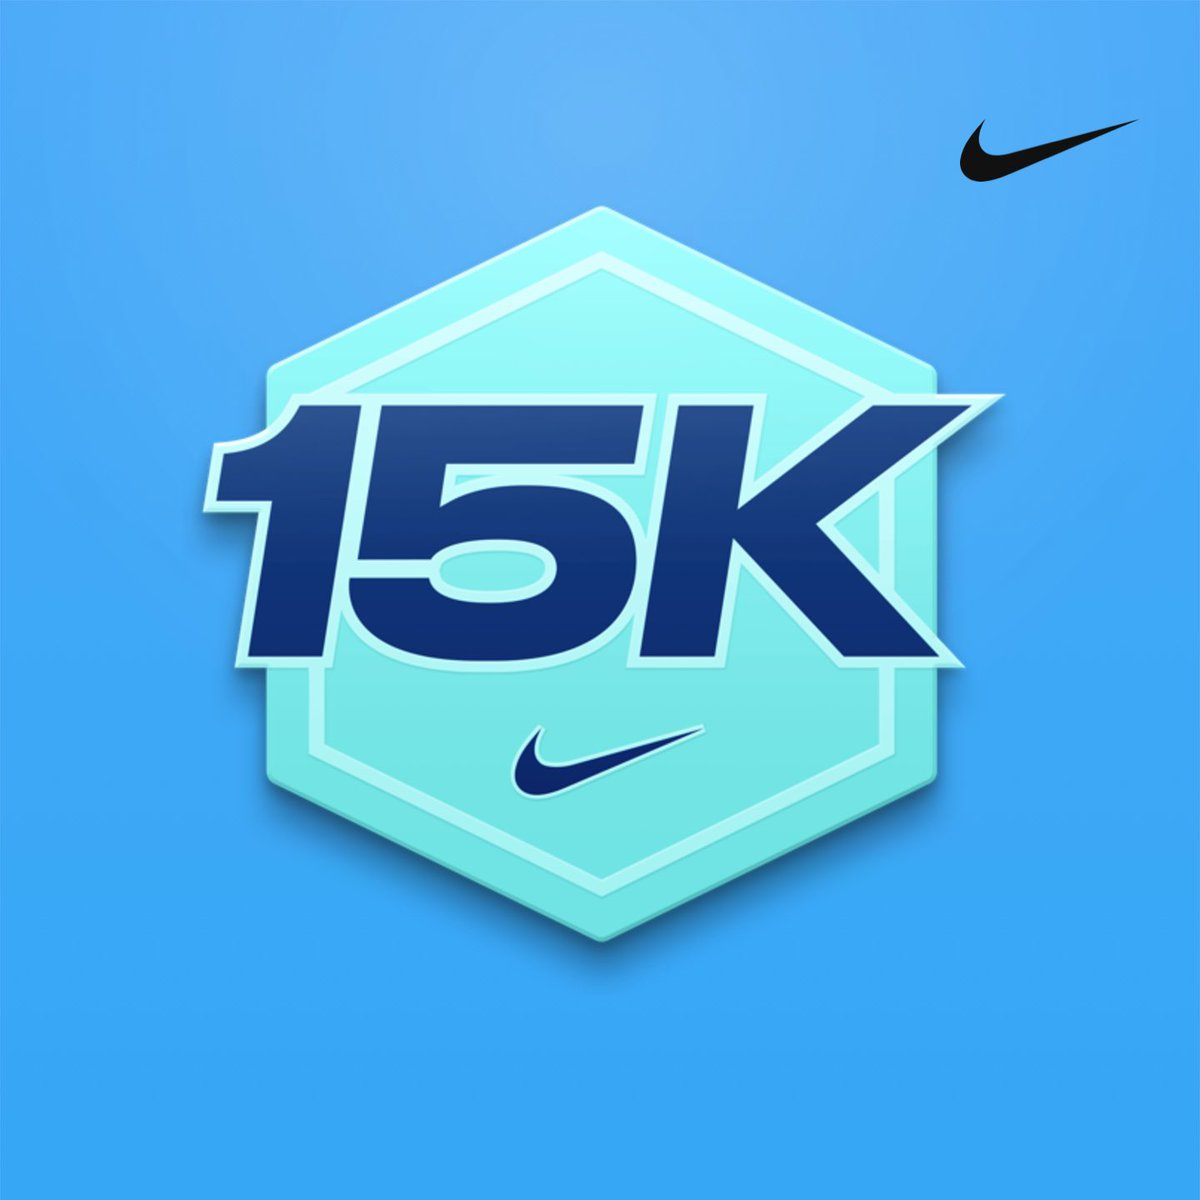 I completed the December Challenge #movewithhart #hustlehart #moonshot @NikeService